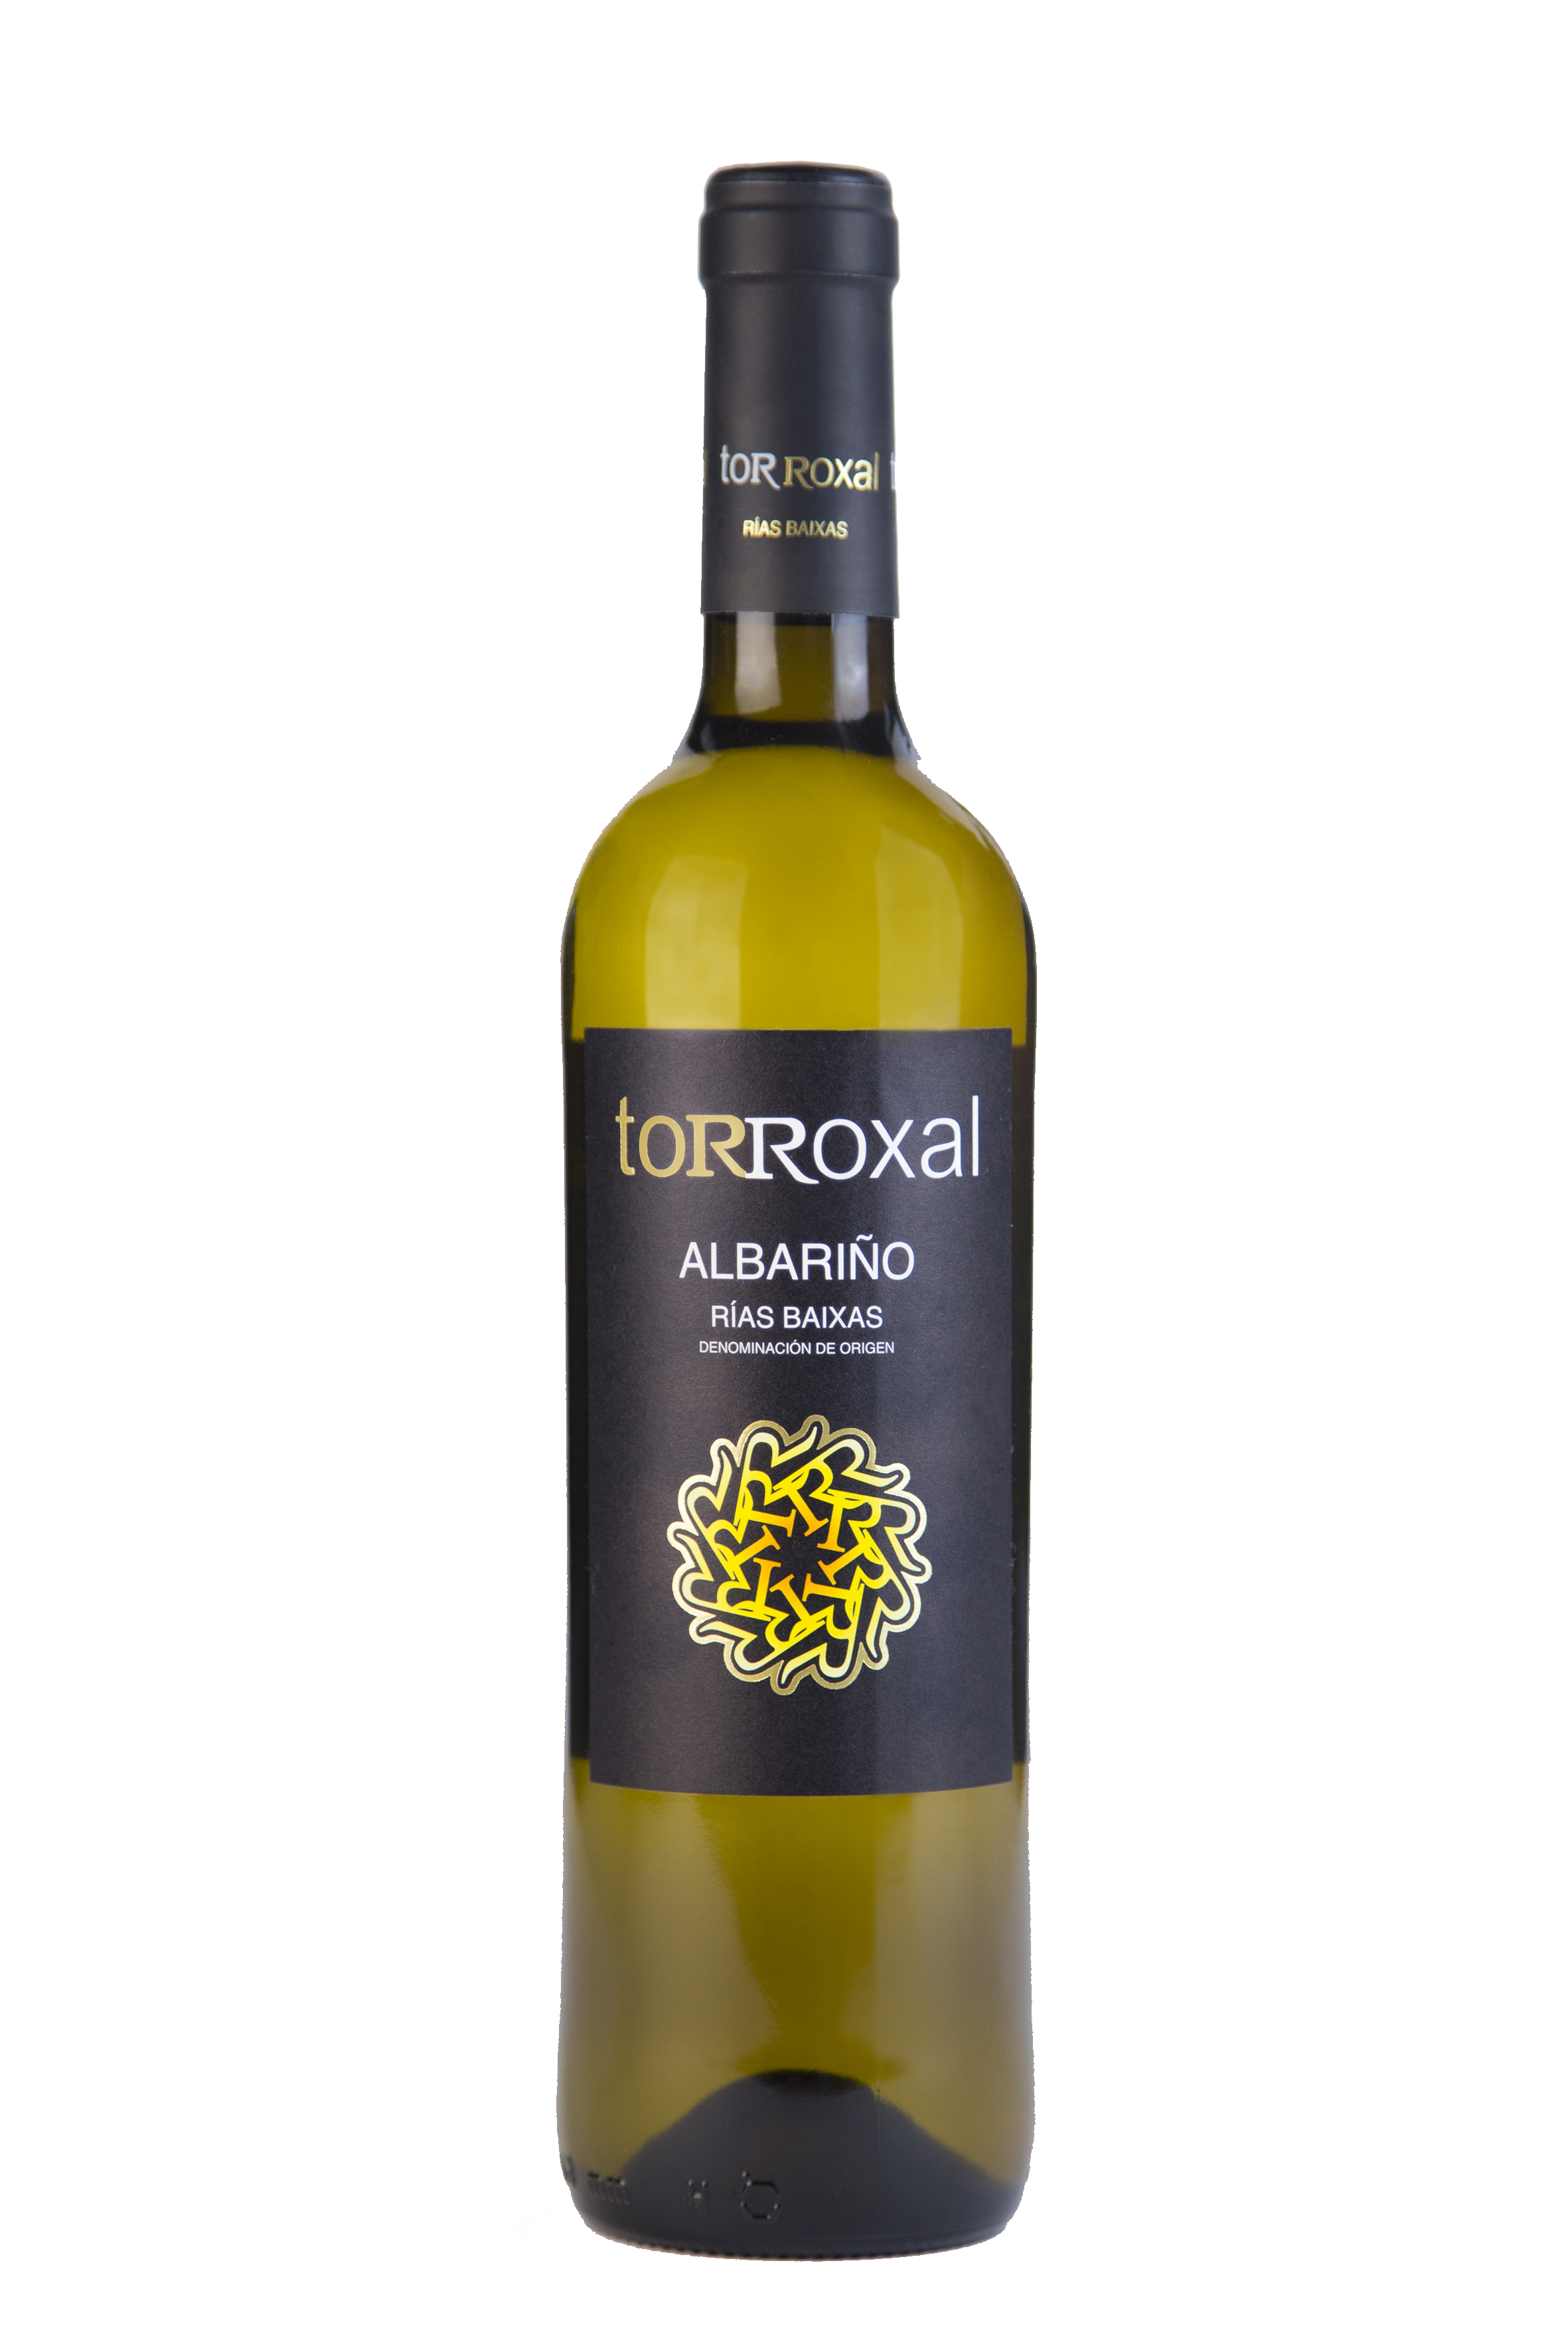 Albarin¦âo Torroxal